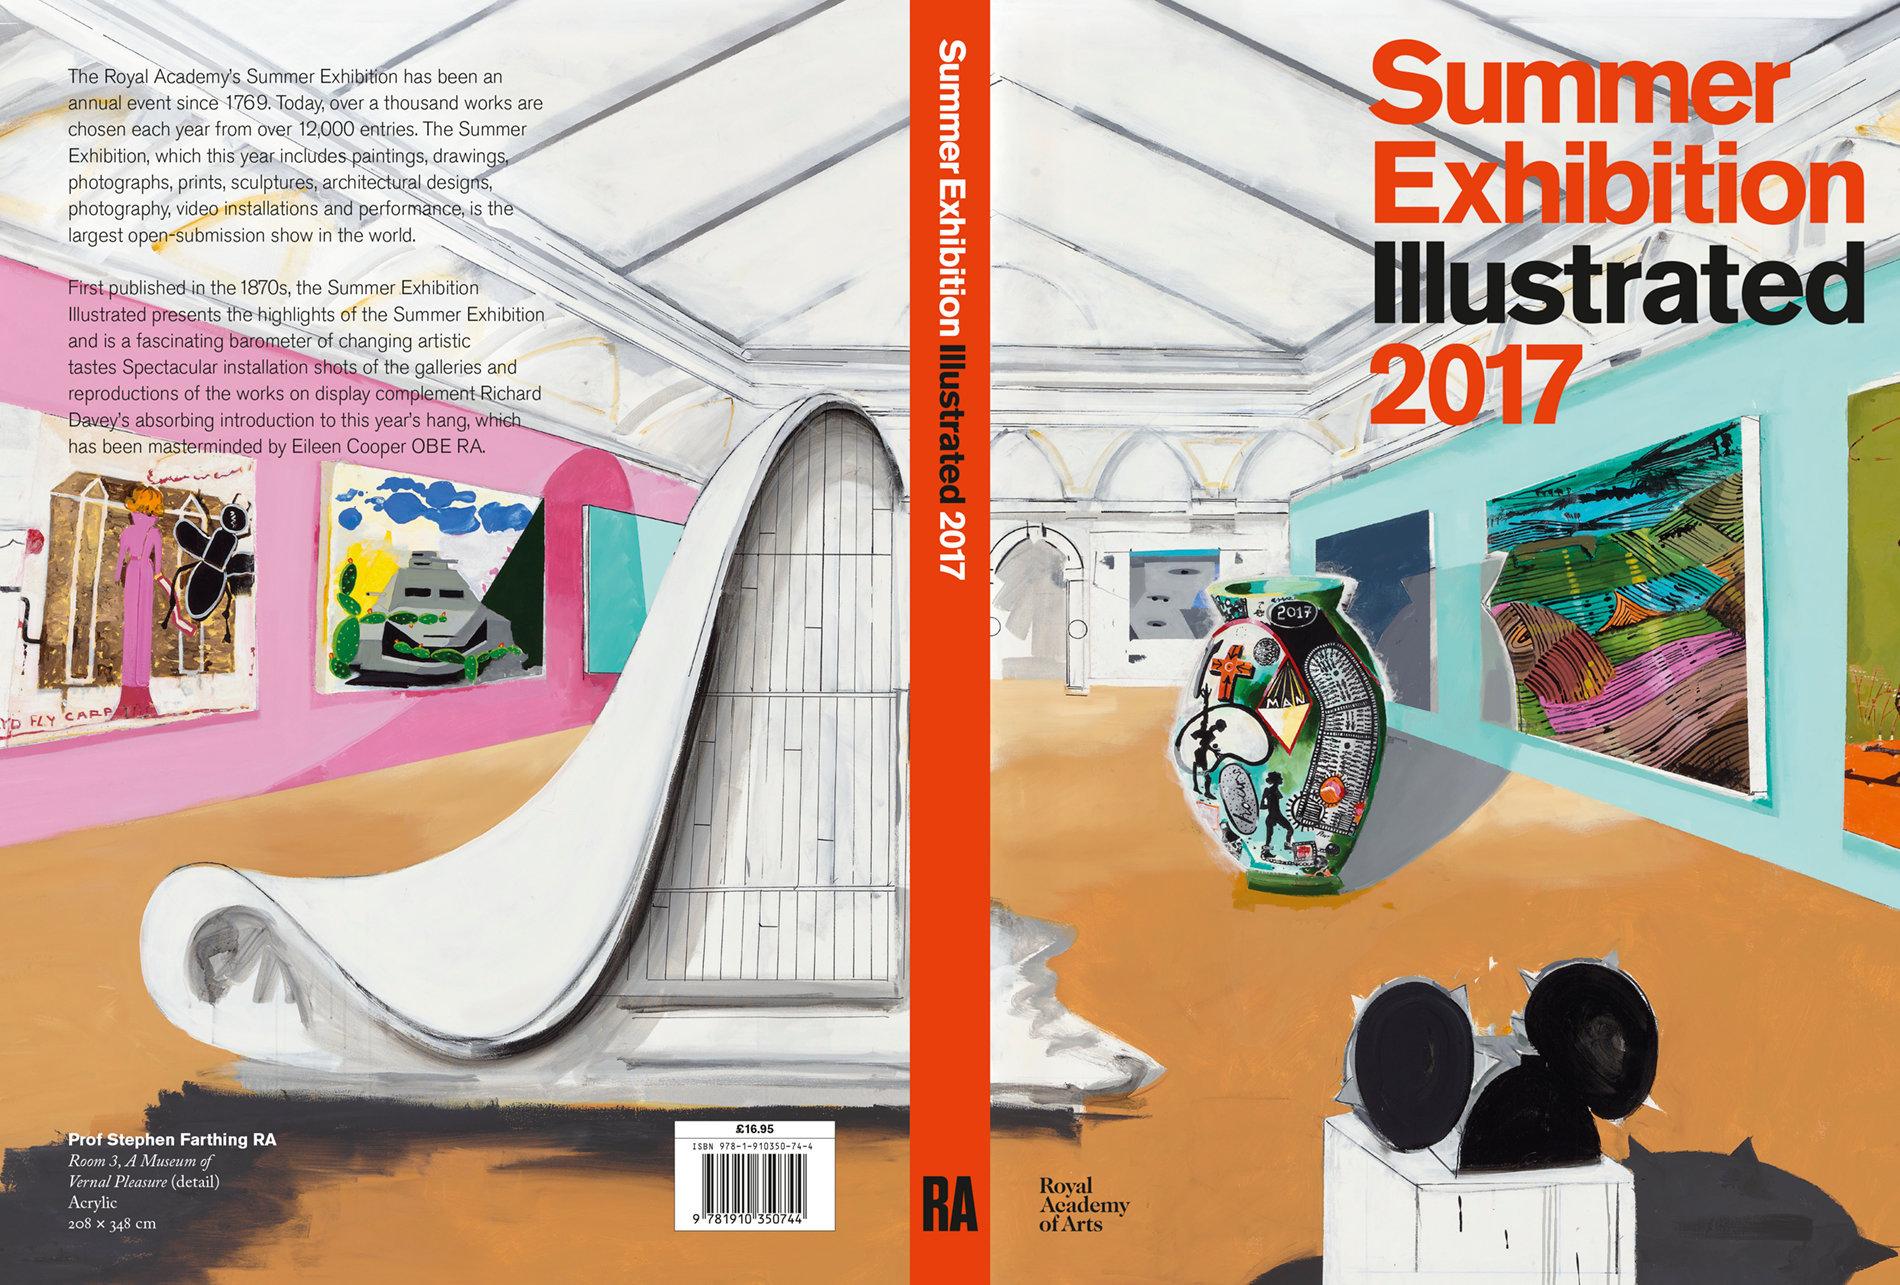 RA Summer Exhibition Illustrated 2017